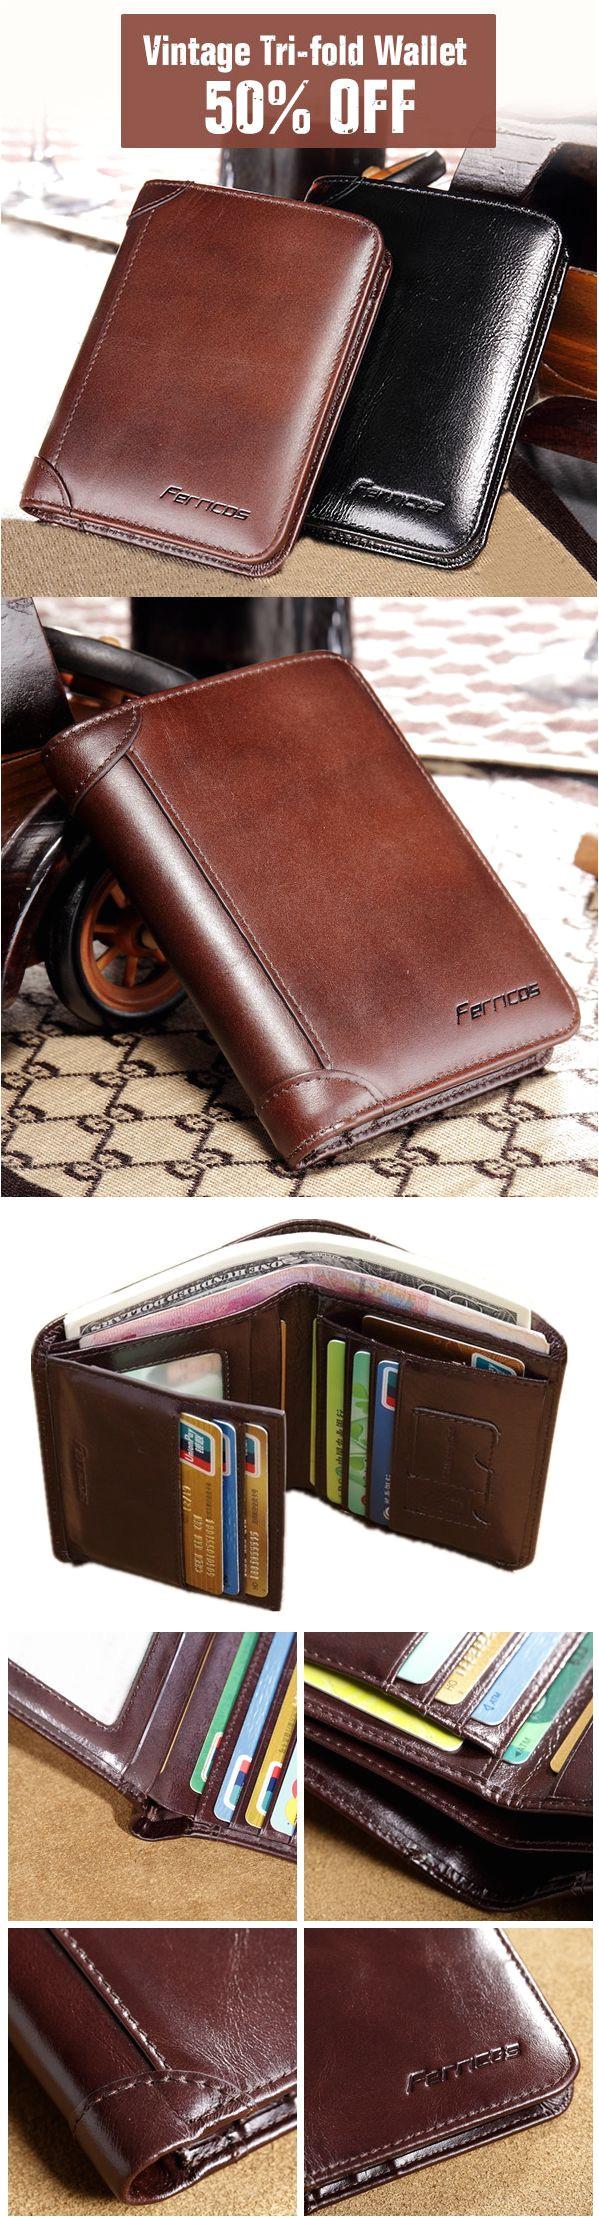 ferricos rfid antimagnetic genuine leather vintage tri fold large capacity short wallet for men